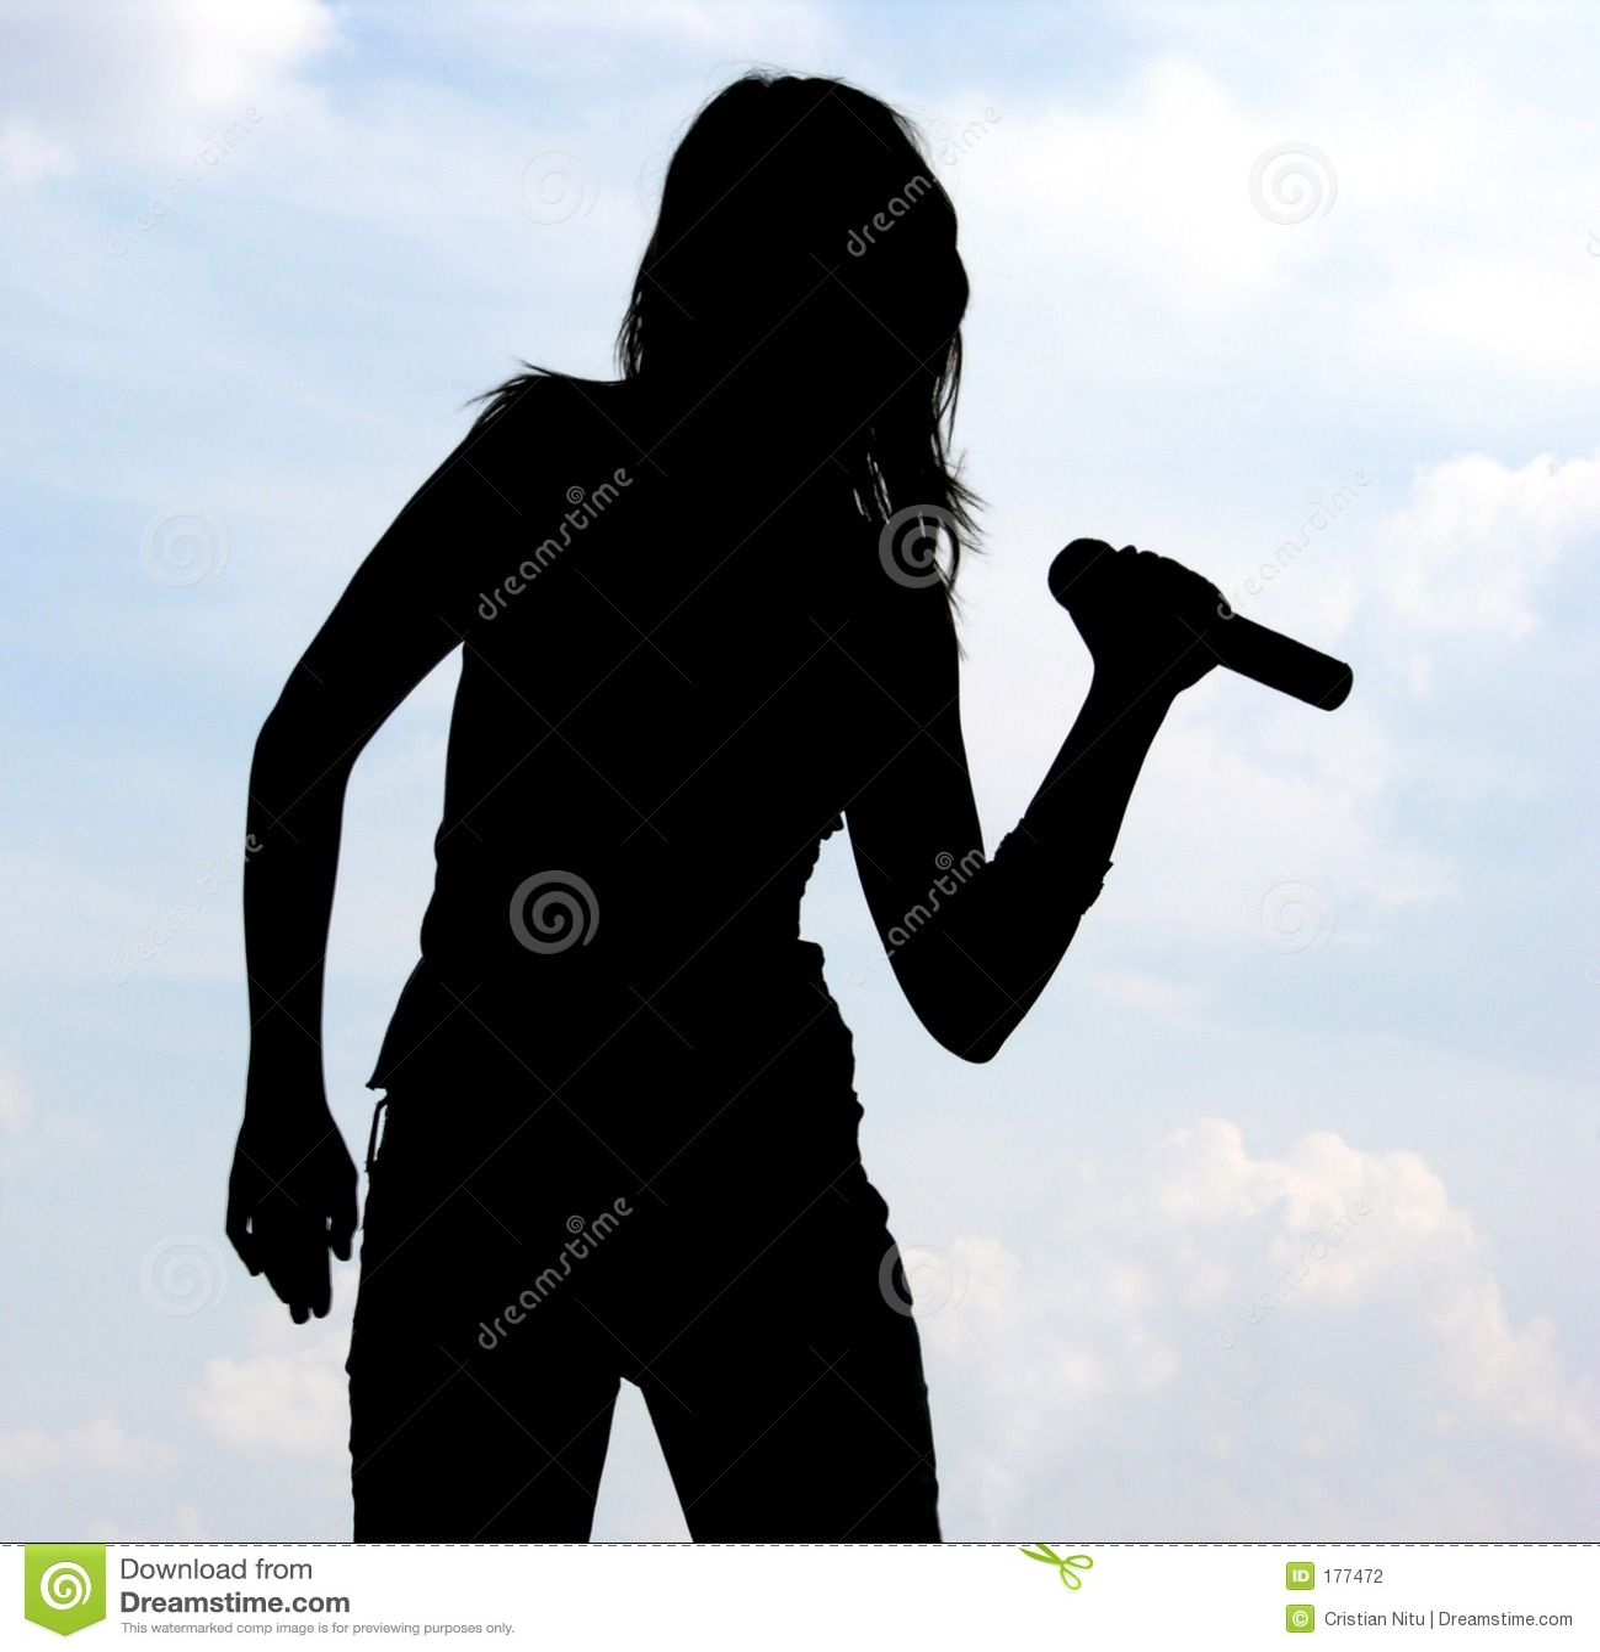 Silhouette de fille chanteuse